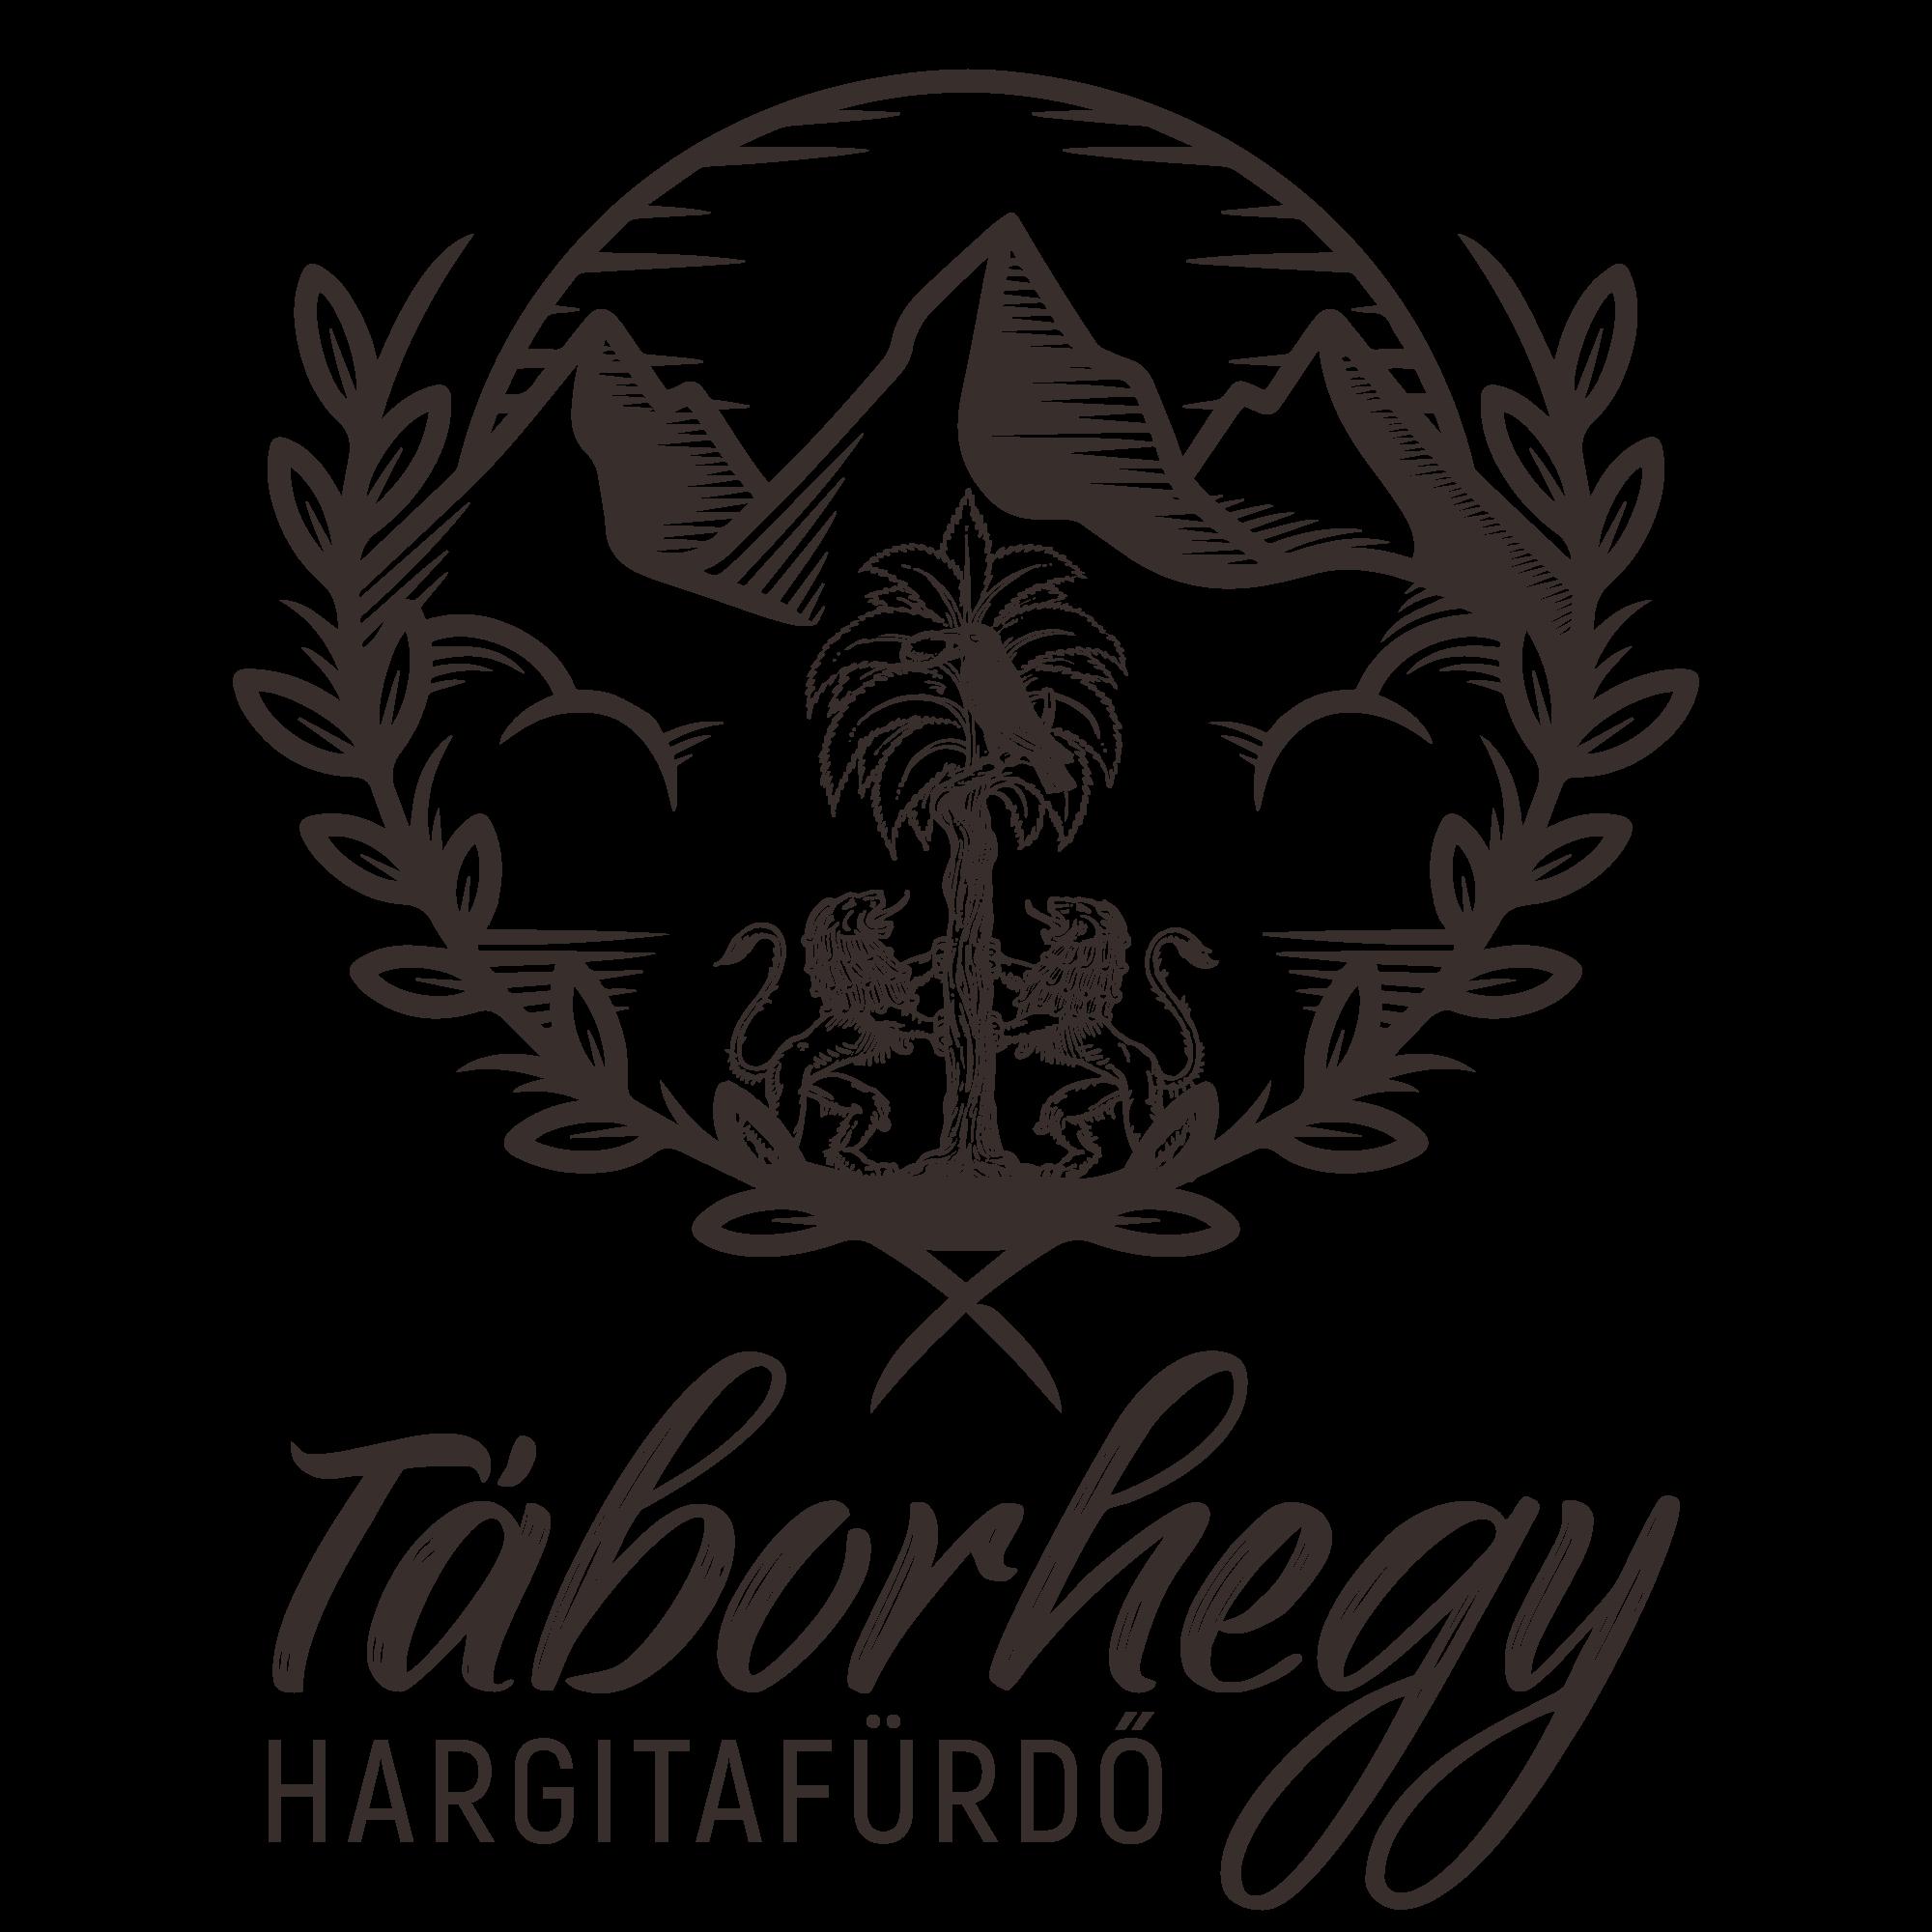 taborhegy_logo_2000x1000